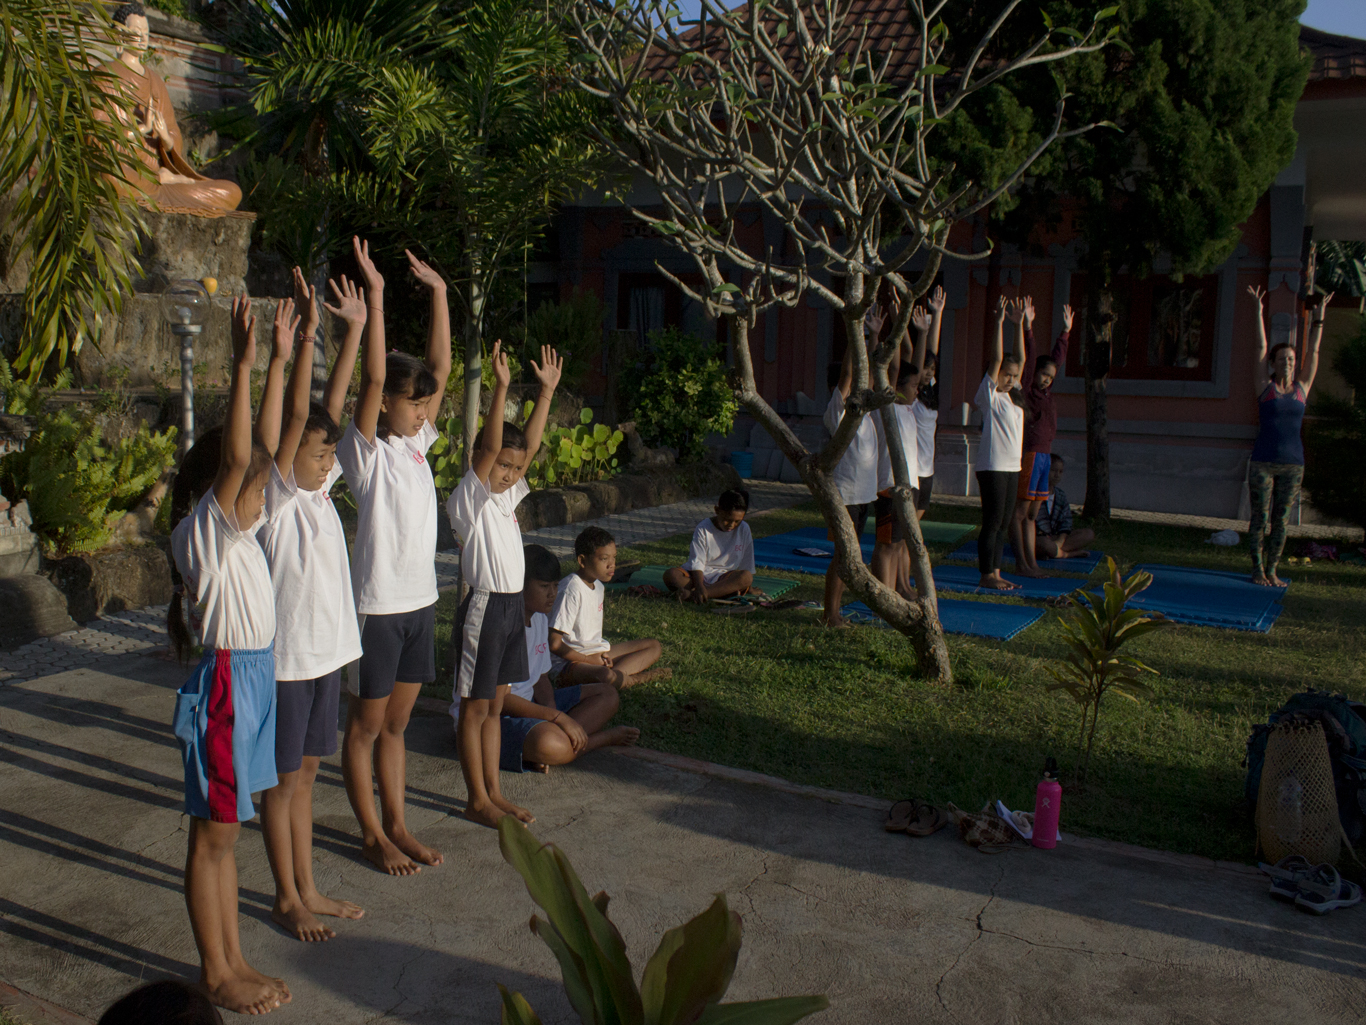 Yogi says arms reach up to the sky...